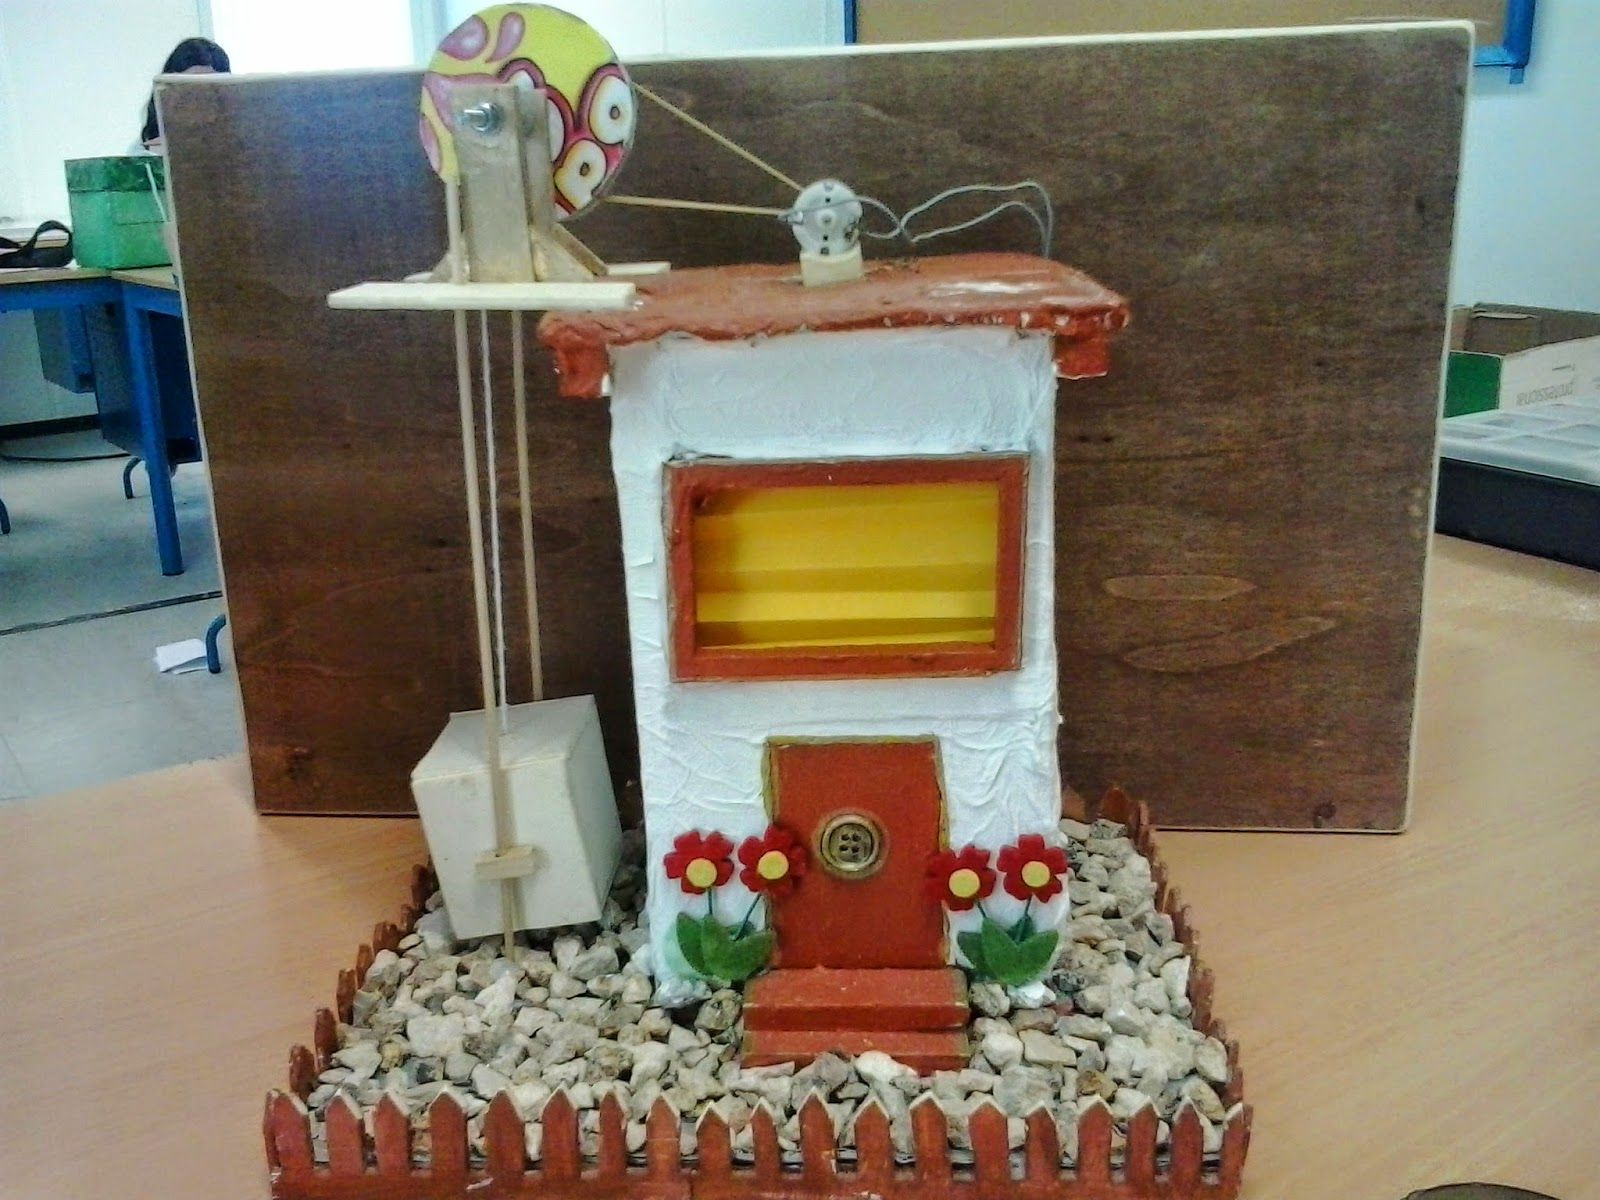 Proyectos de tecnolog a casa con ascensor proyectos - Tecnologia in casa ...